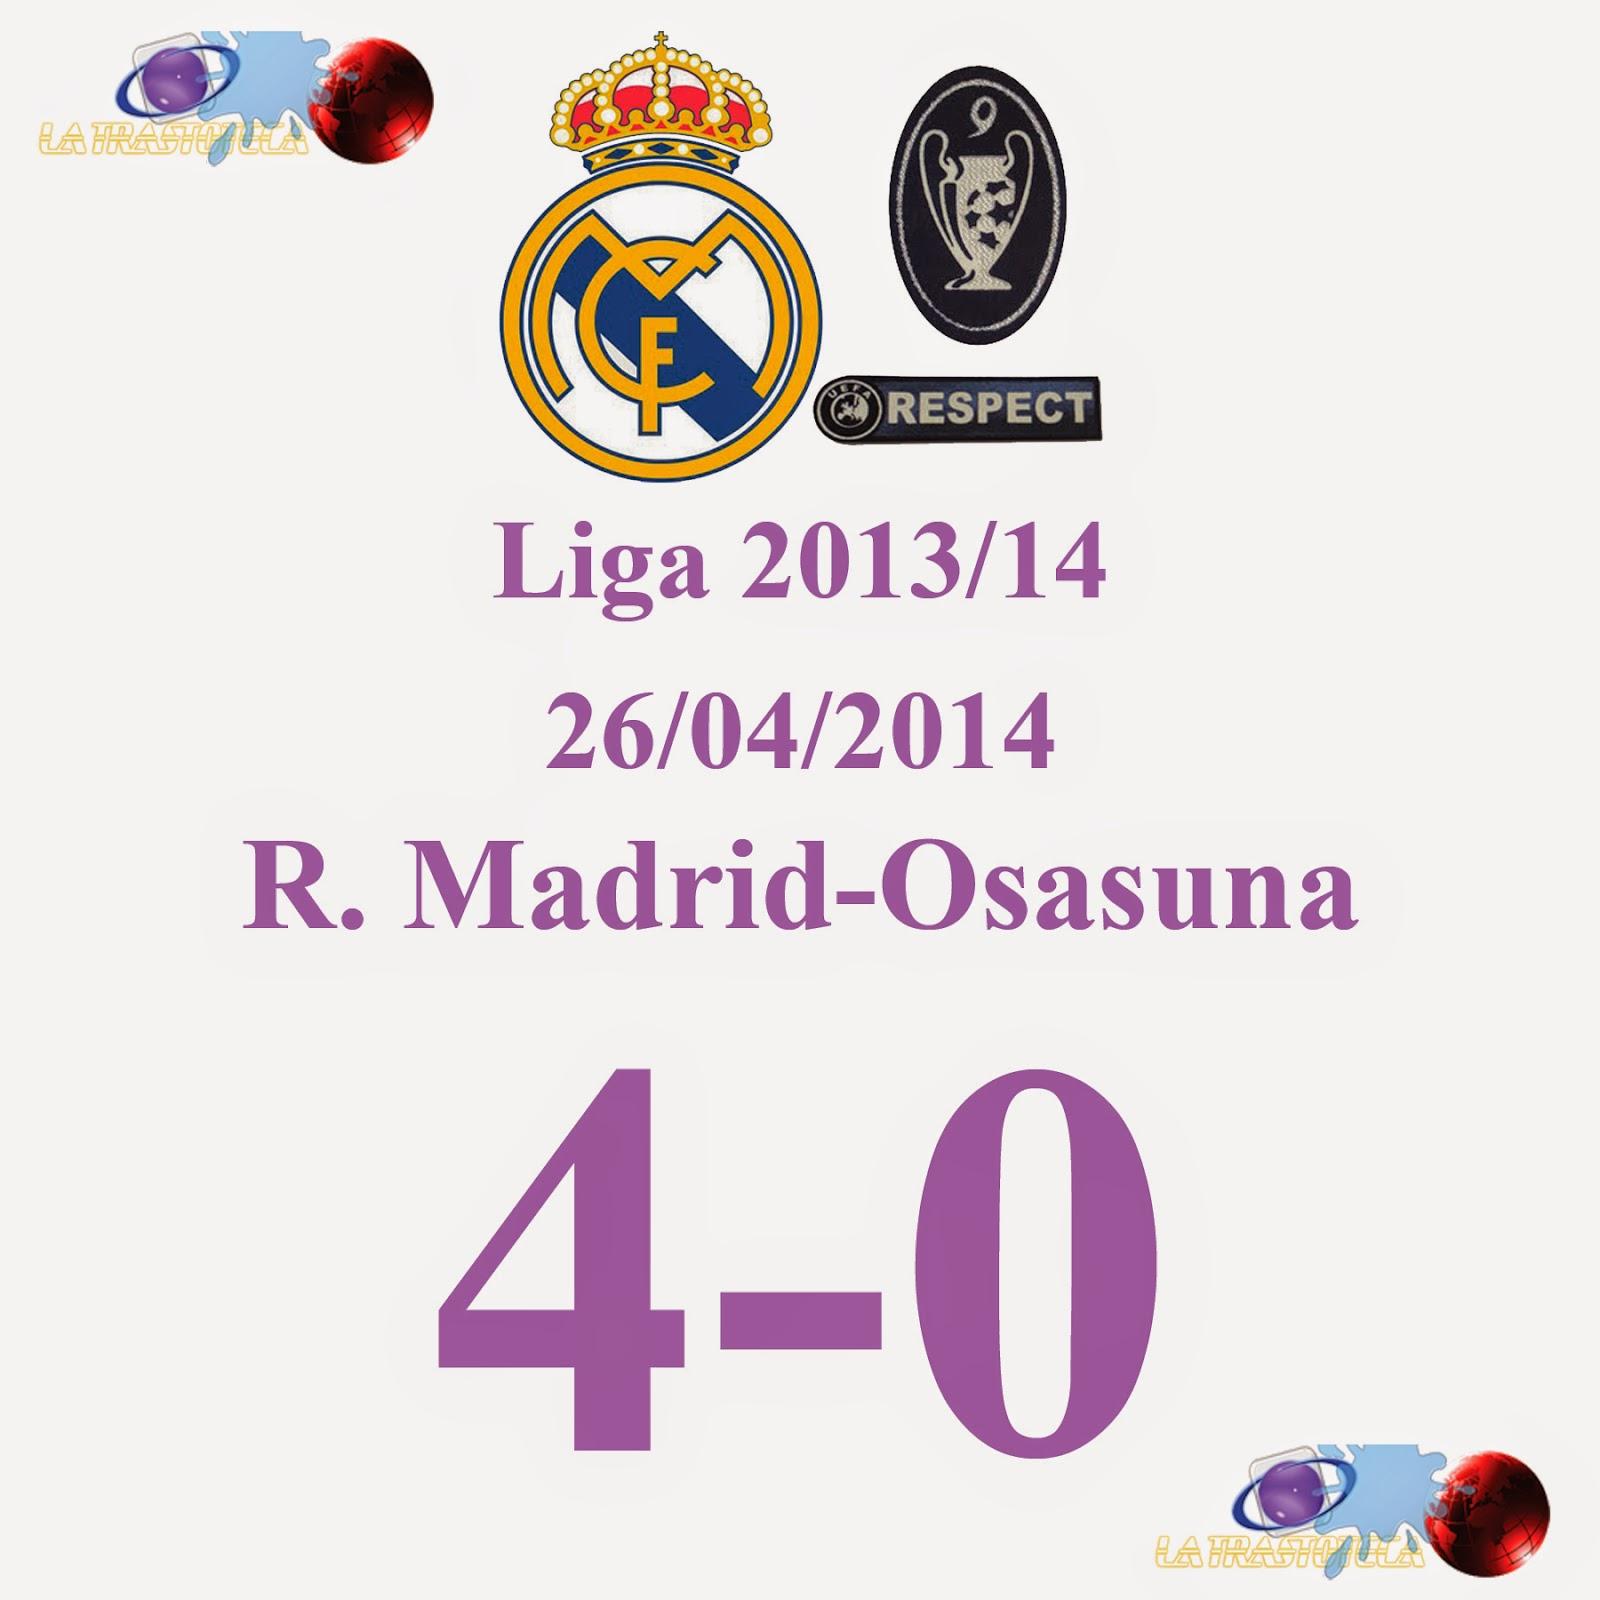 Real Madrid 4 - Osasuna (Jornada 35) 26/04/2014 - Doblete de Cristiano Ronaldo